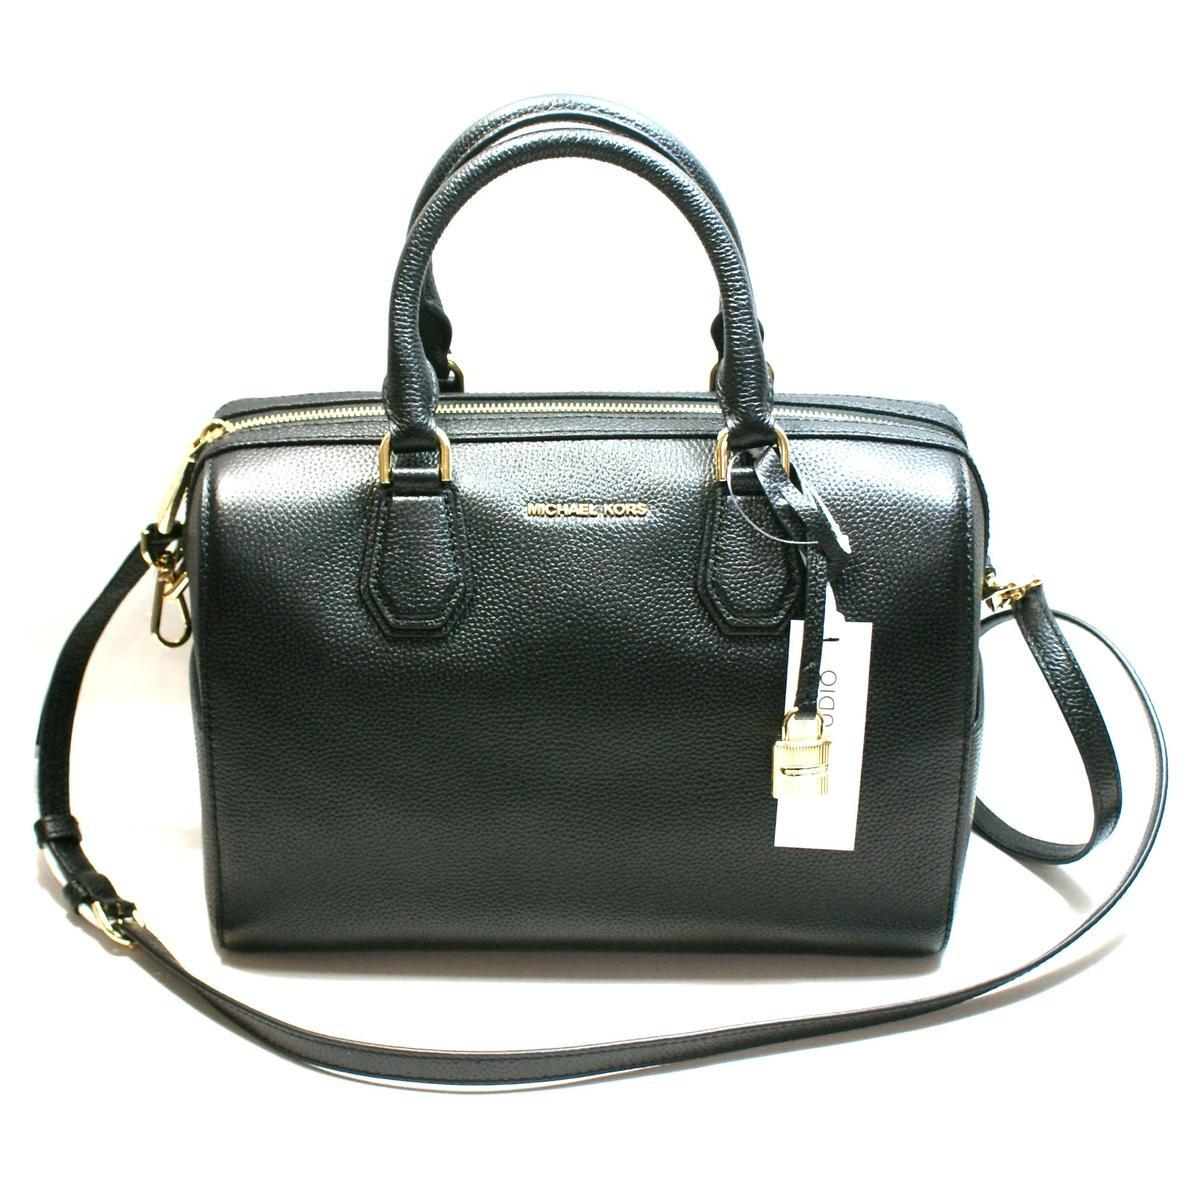 b7e8b5a71126d Home · Michael Kors · Mercer Medium Duffle Leather Black Satchel  Crossbody  Bag. CLICK THUMBNAIL TO ZOOM. Found In  Handbags